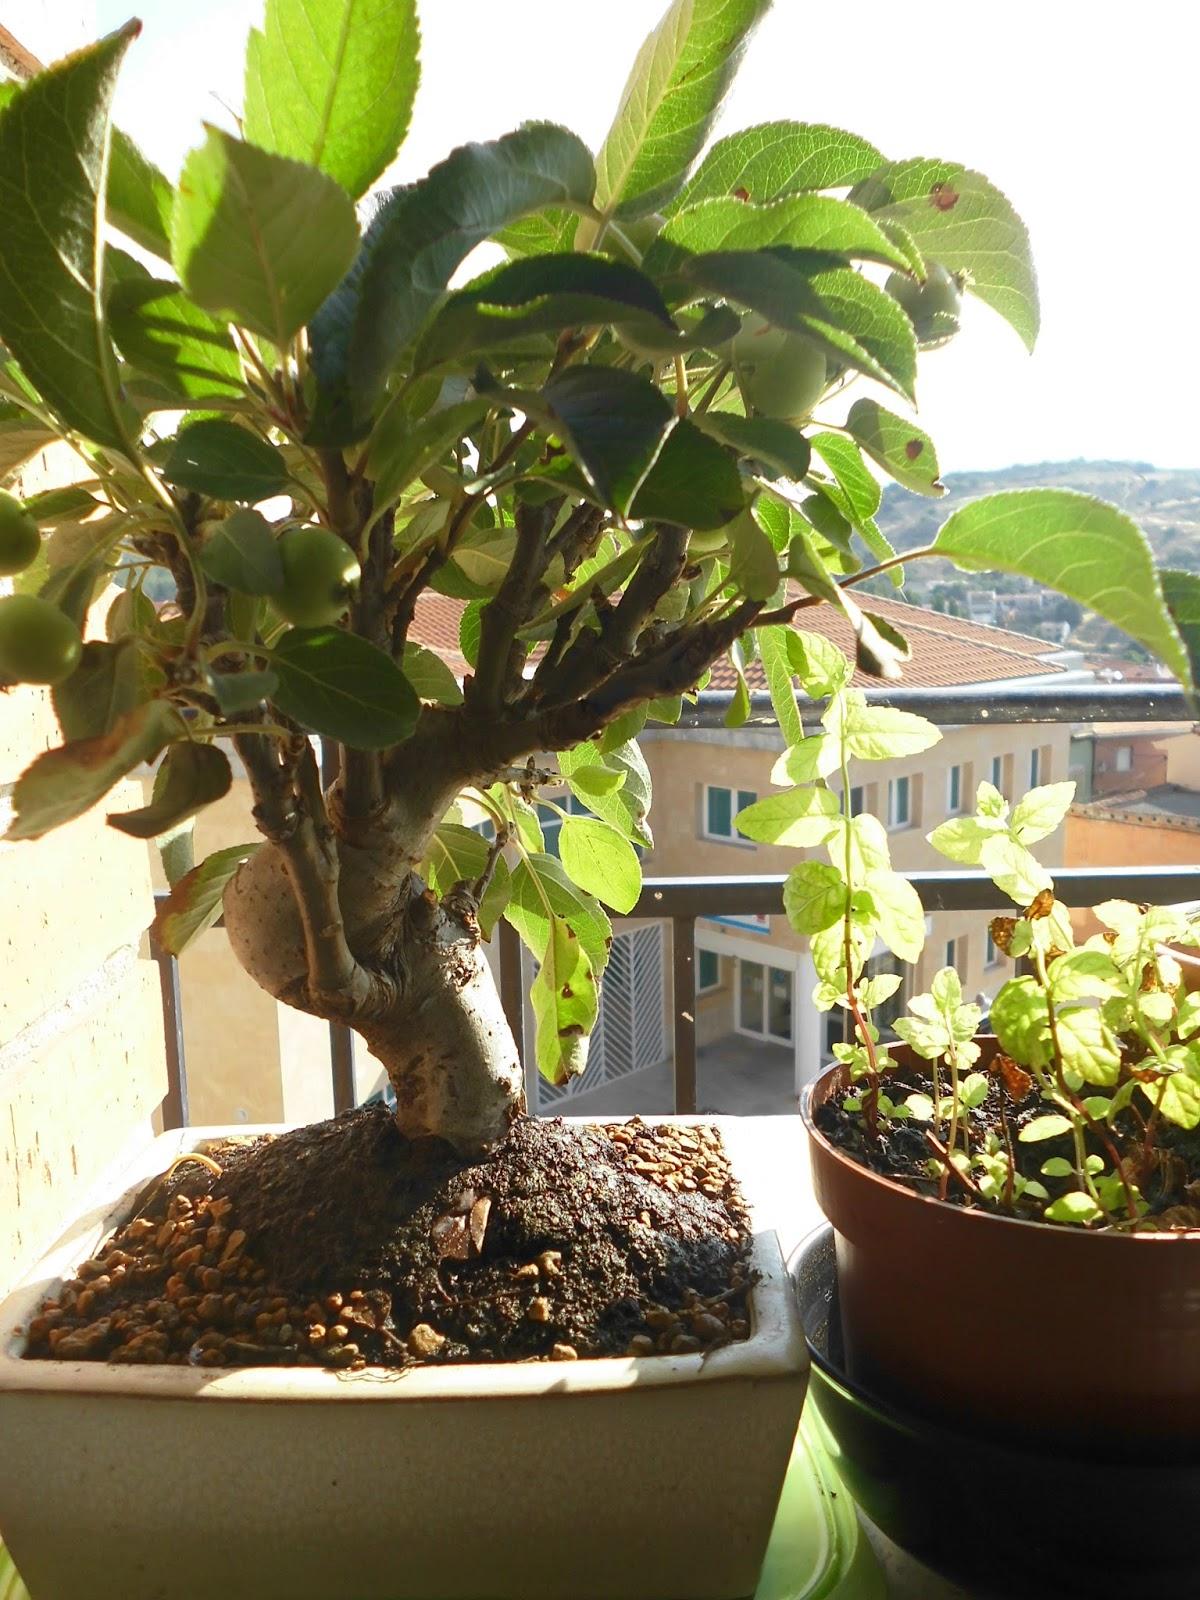 Estilo y hogar cuidados de un bonsai - Como cuidar bonsais ...